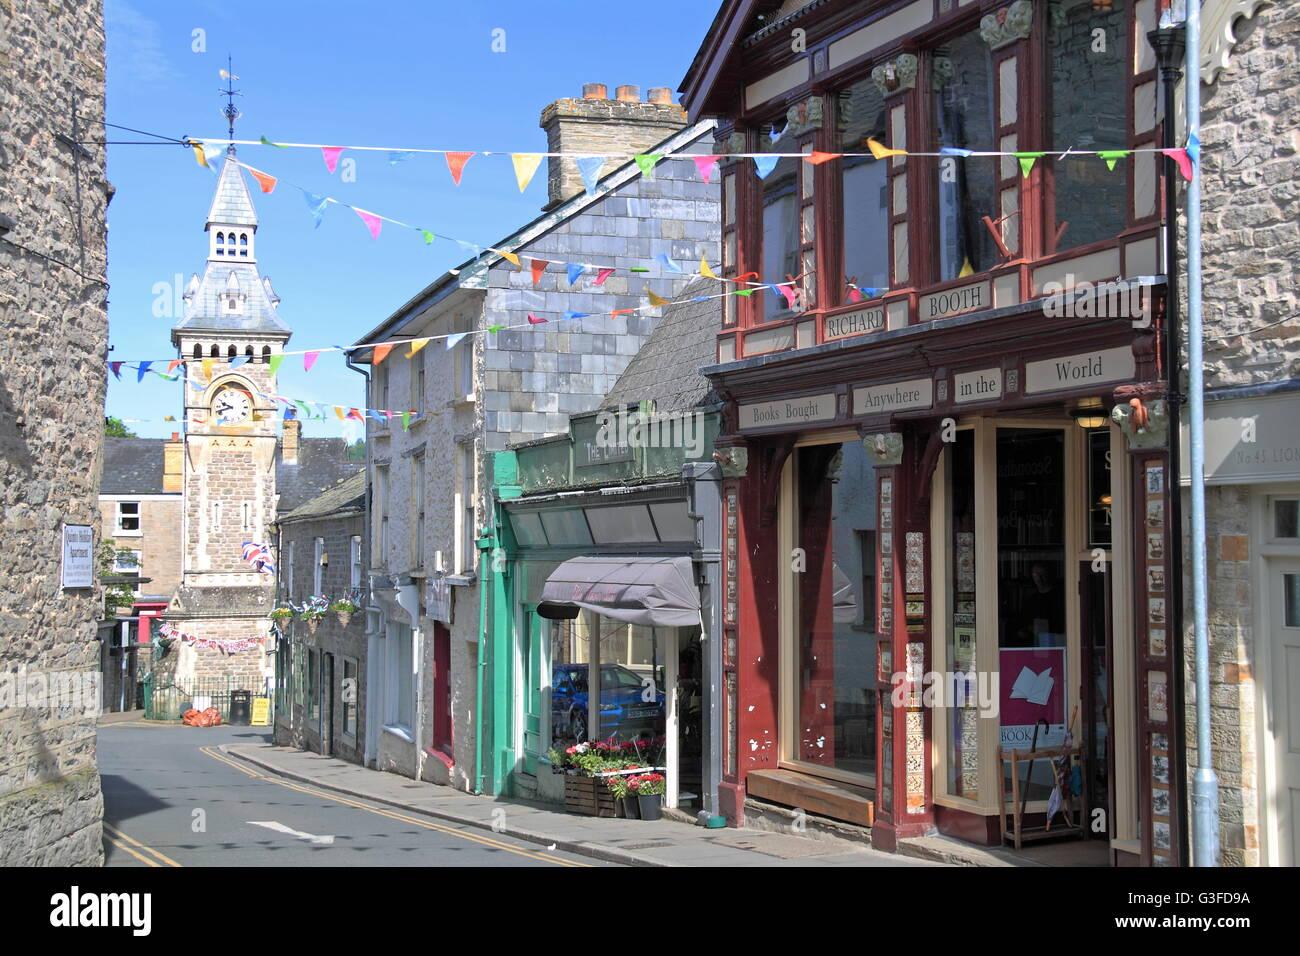 Richard Booth bookshop, Lion Street, Hay-on-Wye, Powys, Wales, Great Britain, United Kingdom, UK, Europe - Stock Image